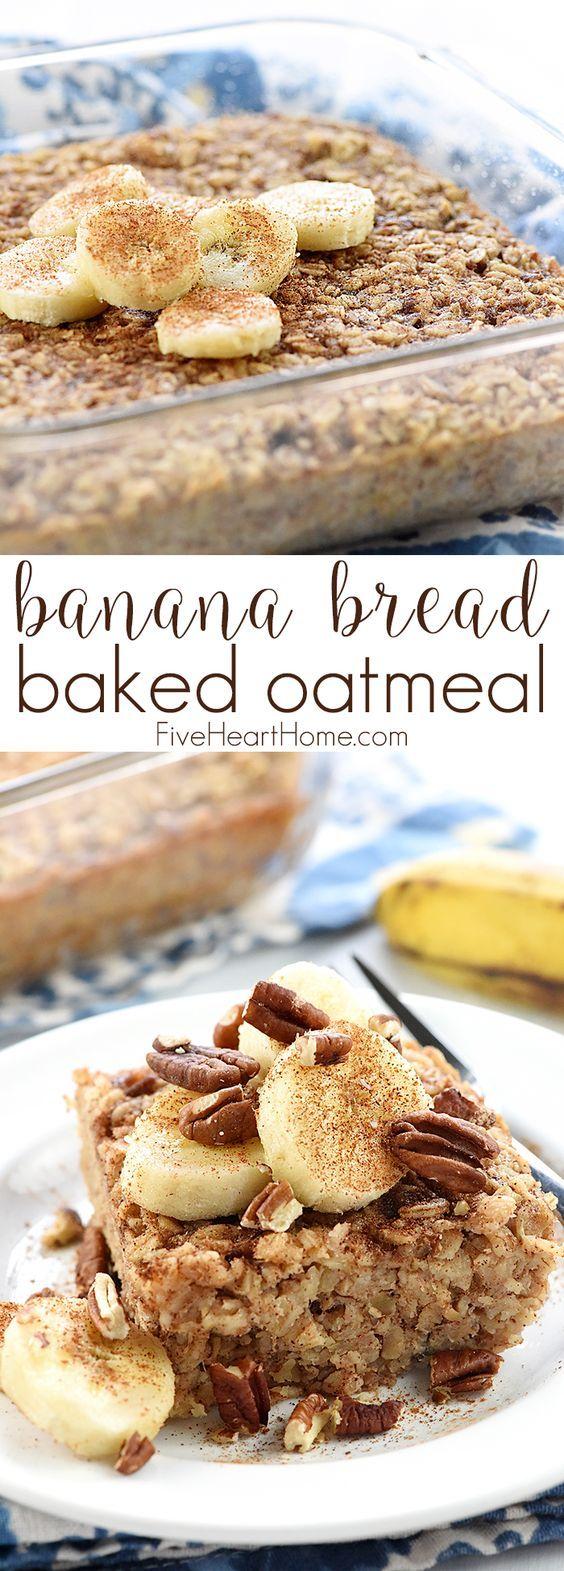 IDEA Health and Fitness Association: Banana Nut Baked Oatmeal